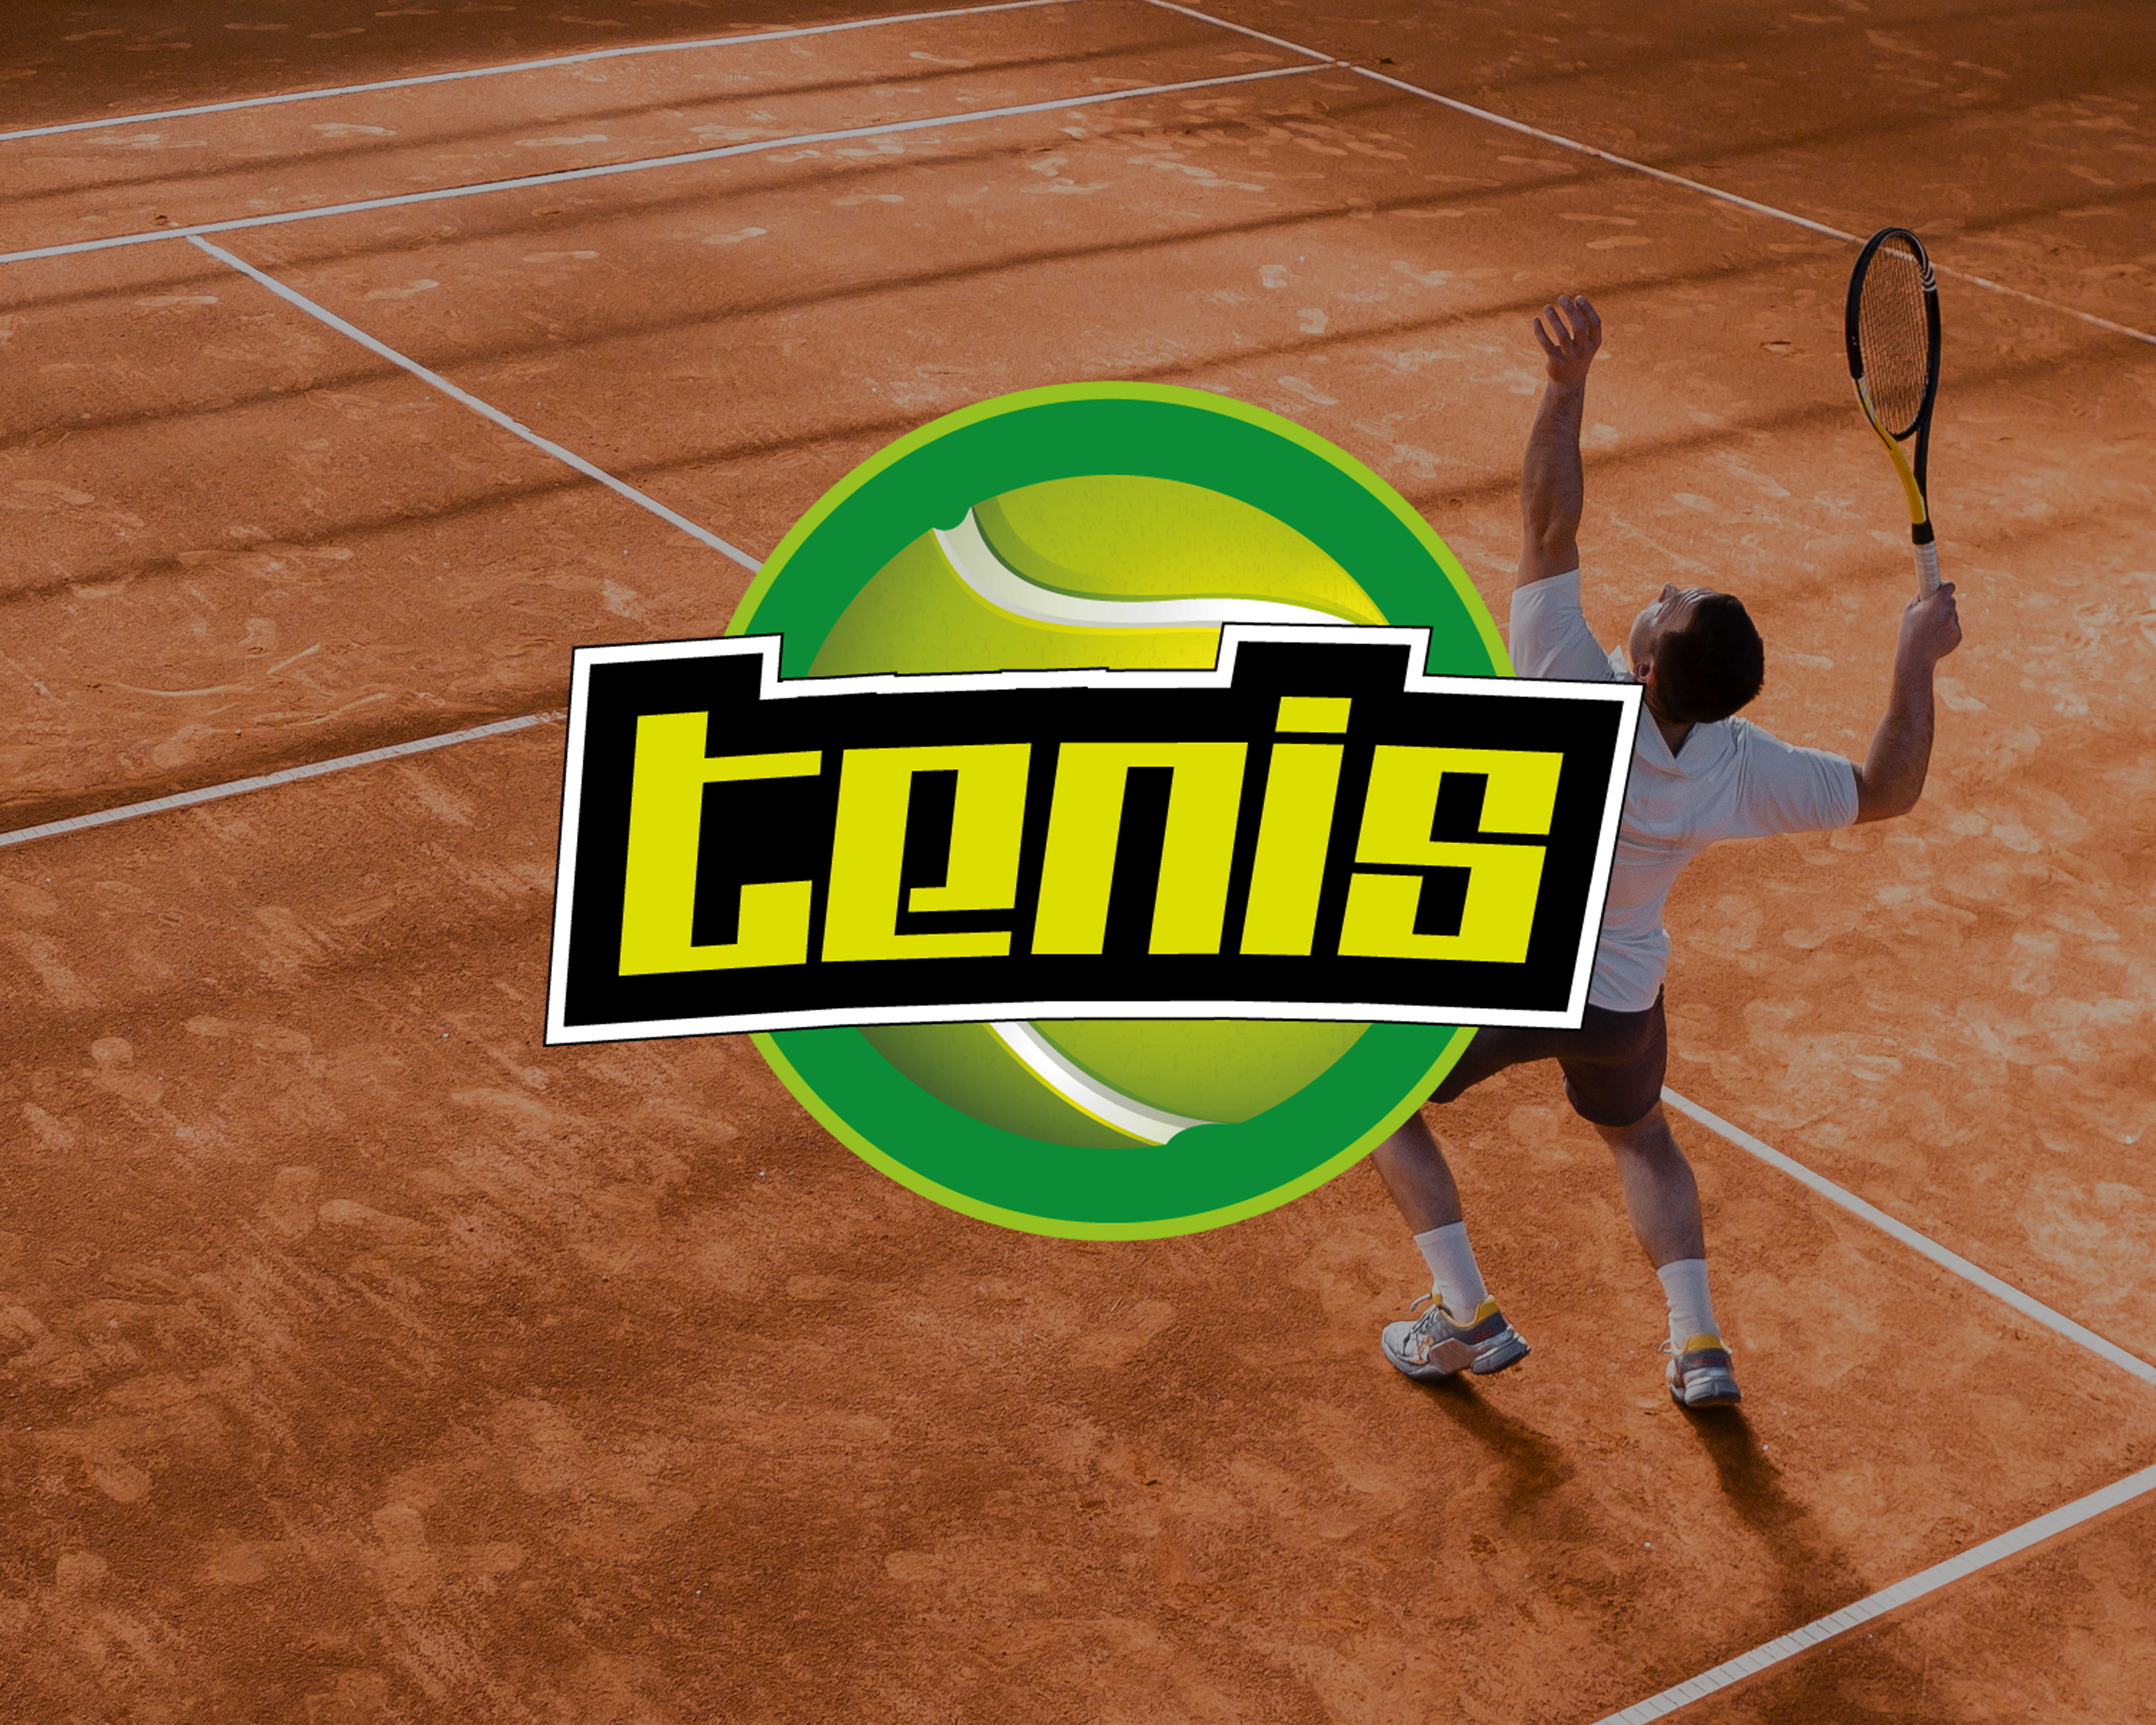 Tenis PDSports